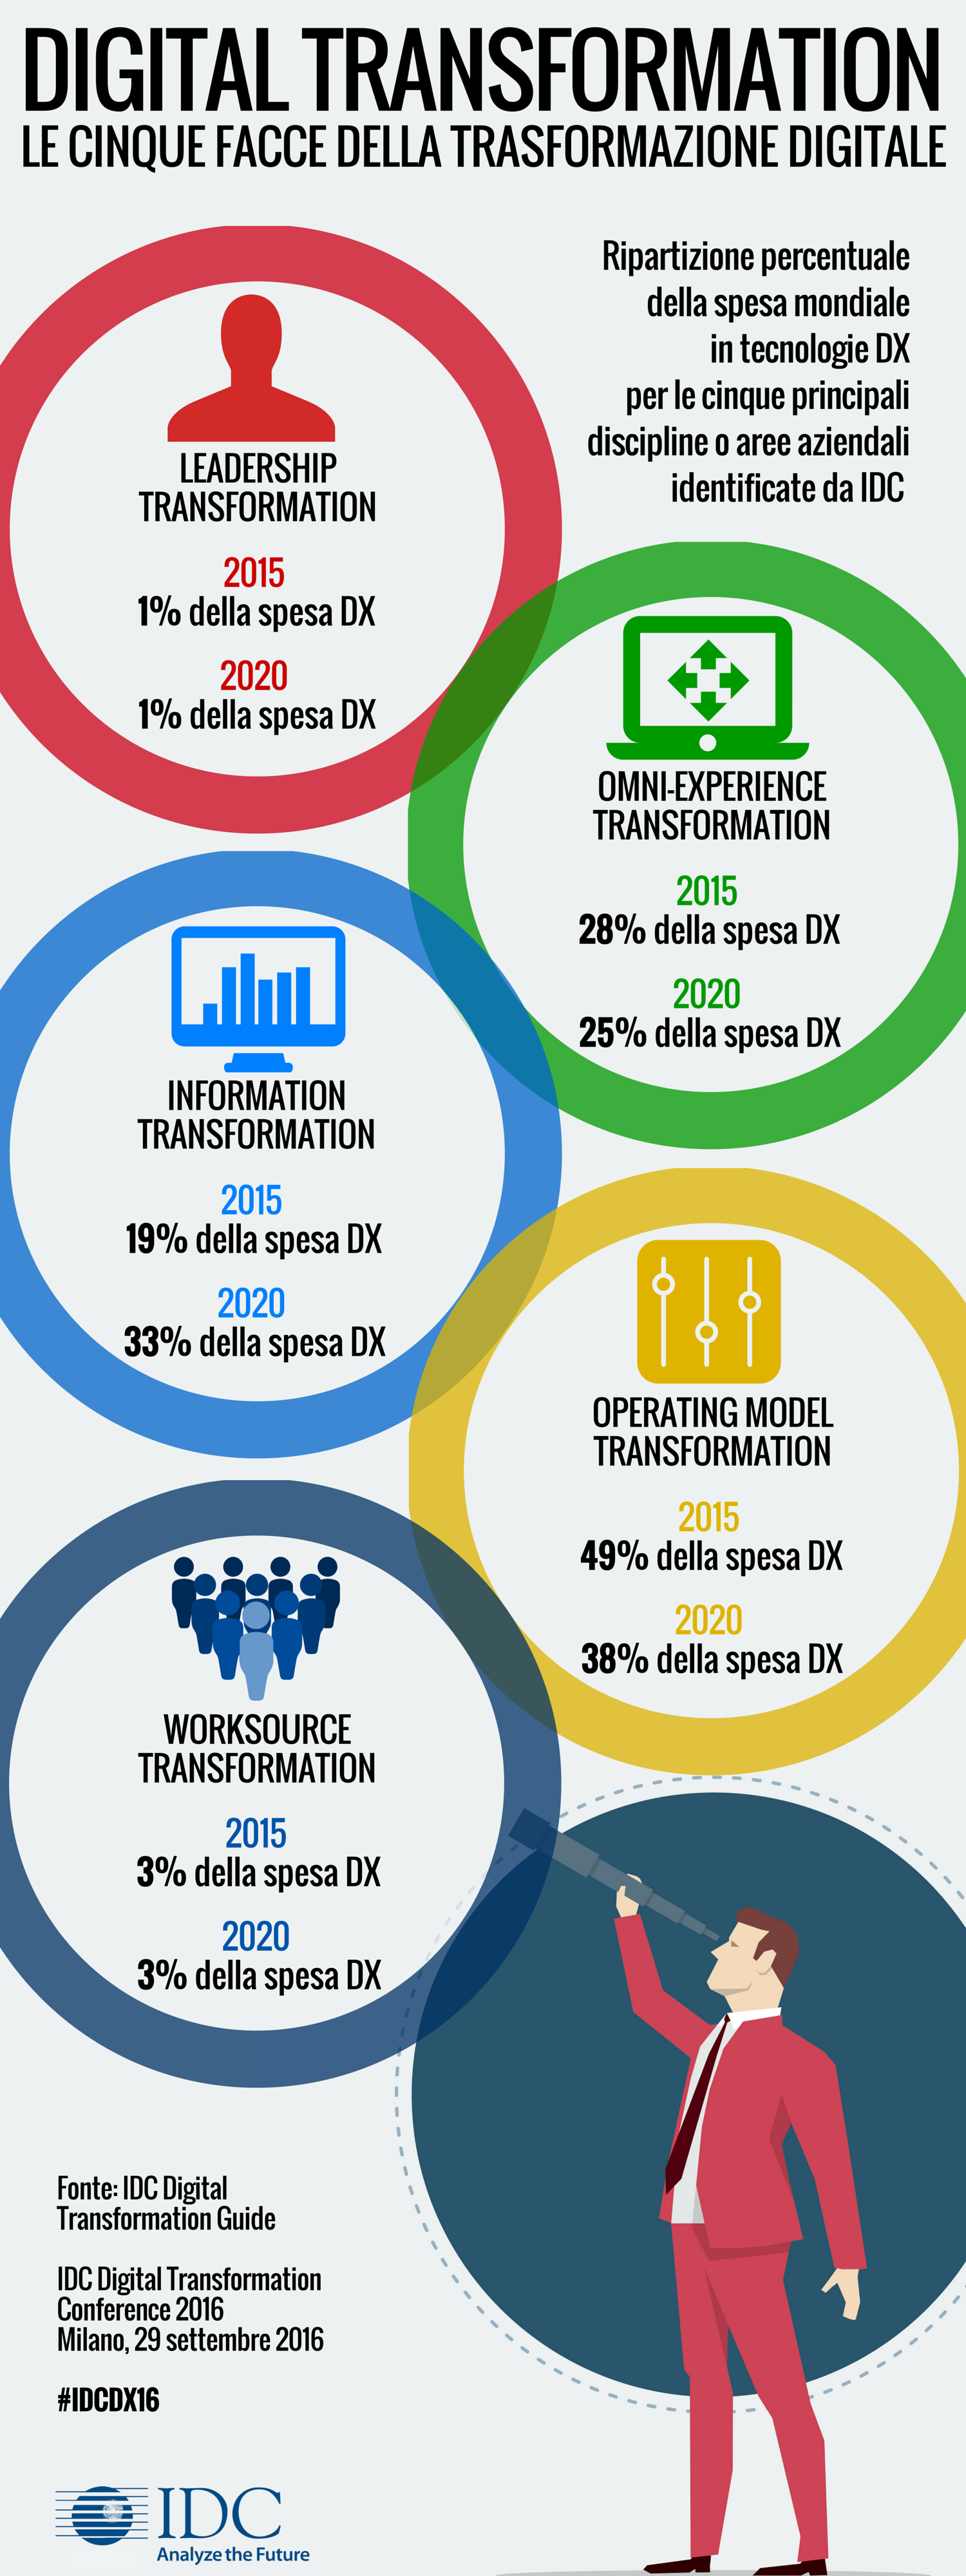 le_cinque_facce_della_digital_transformation